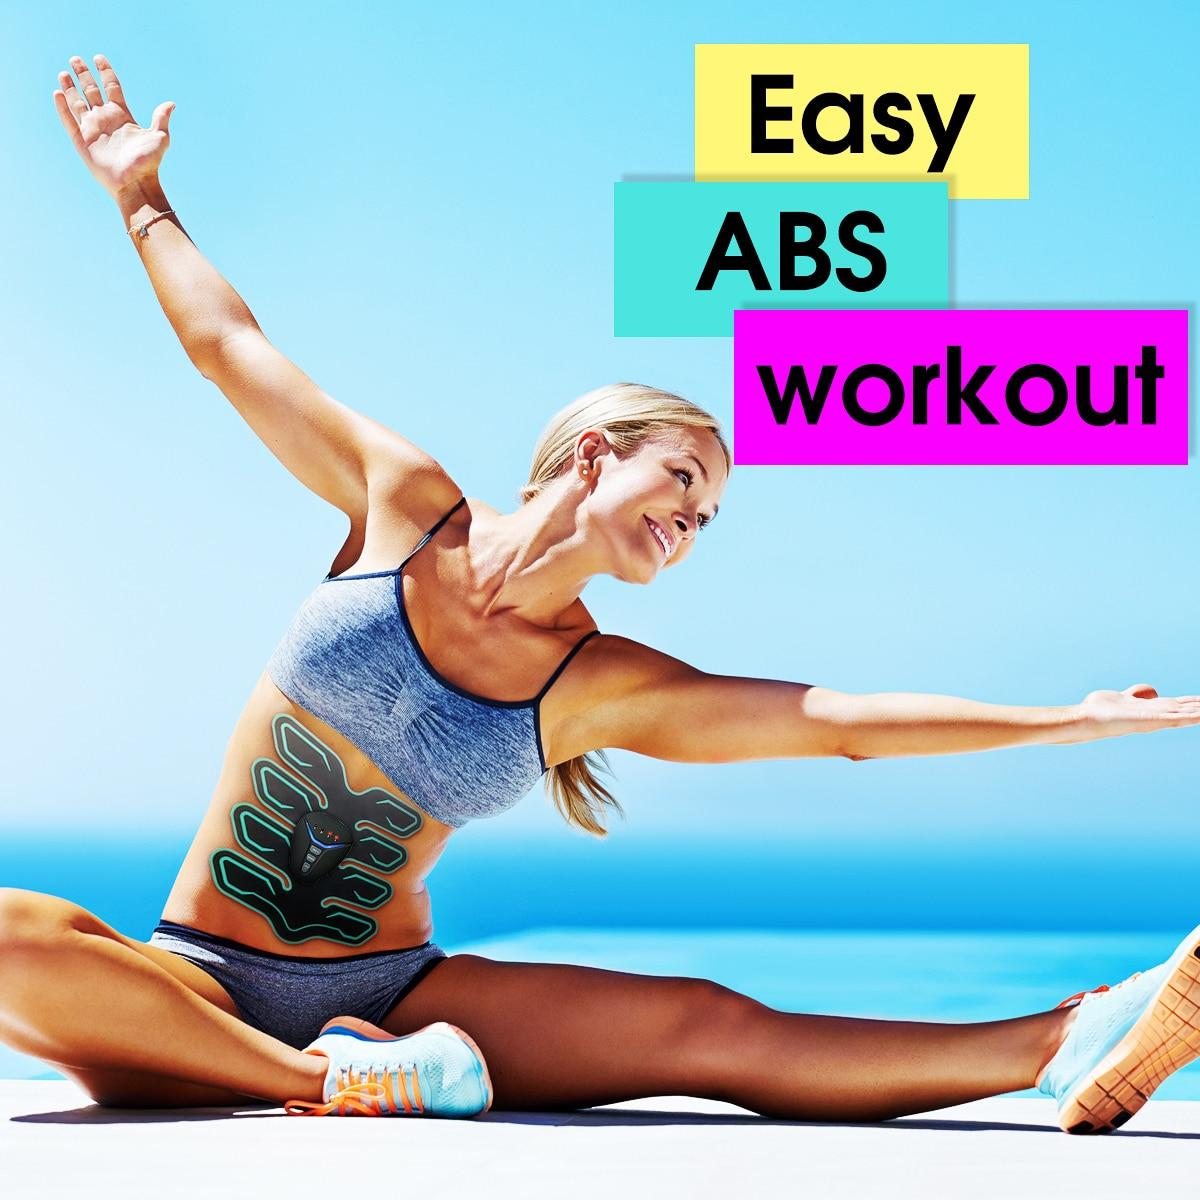 KIFIT 6 Mode 10 Intensity 8 Pads Muscle Training Toning Slim Stimulator Abdominal Electric Weight Loss Slimming Massager